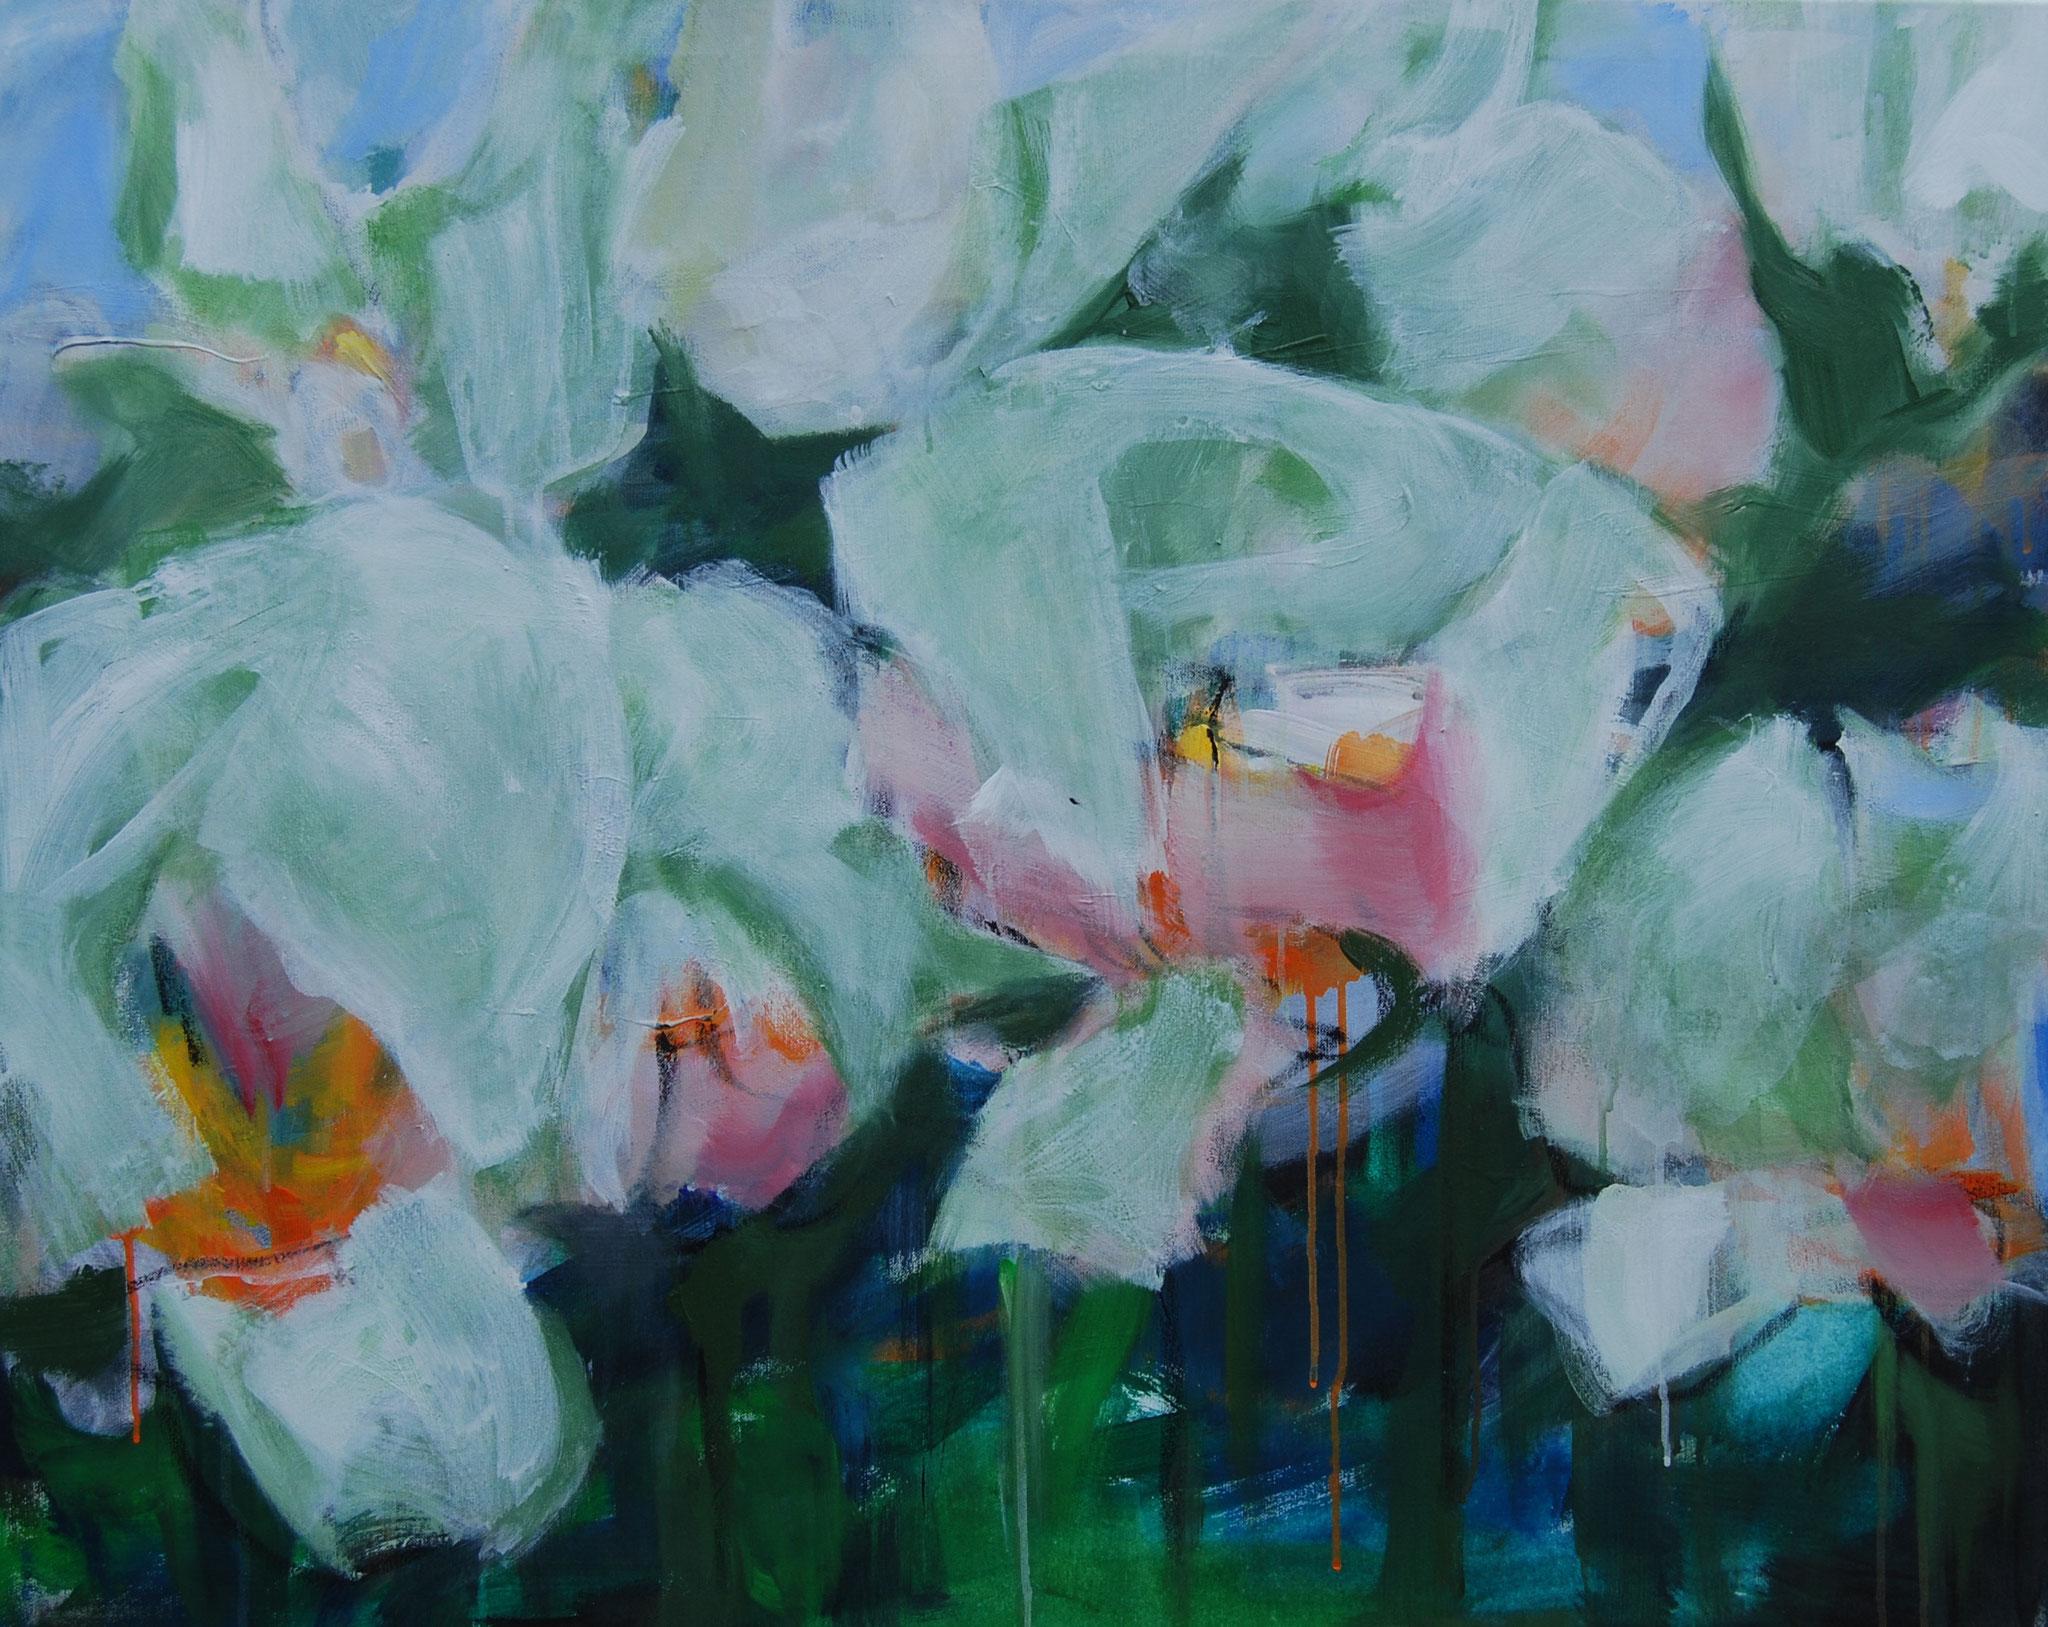 Weiße Tulpen, 2015, Acryl auf Leinwand, 80 x1 00 cm